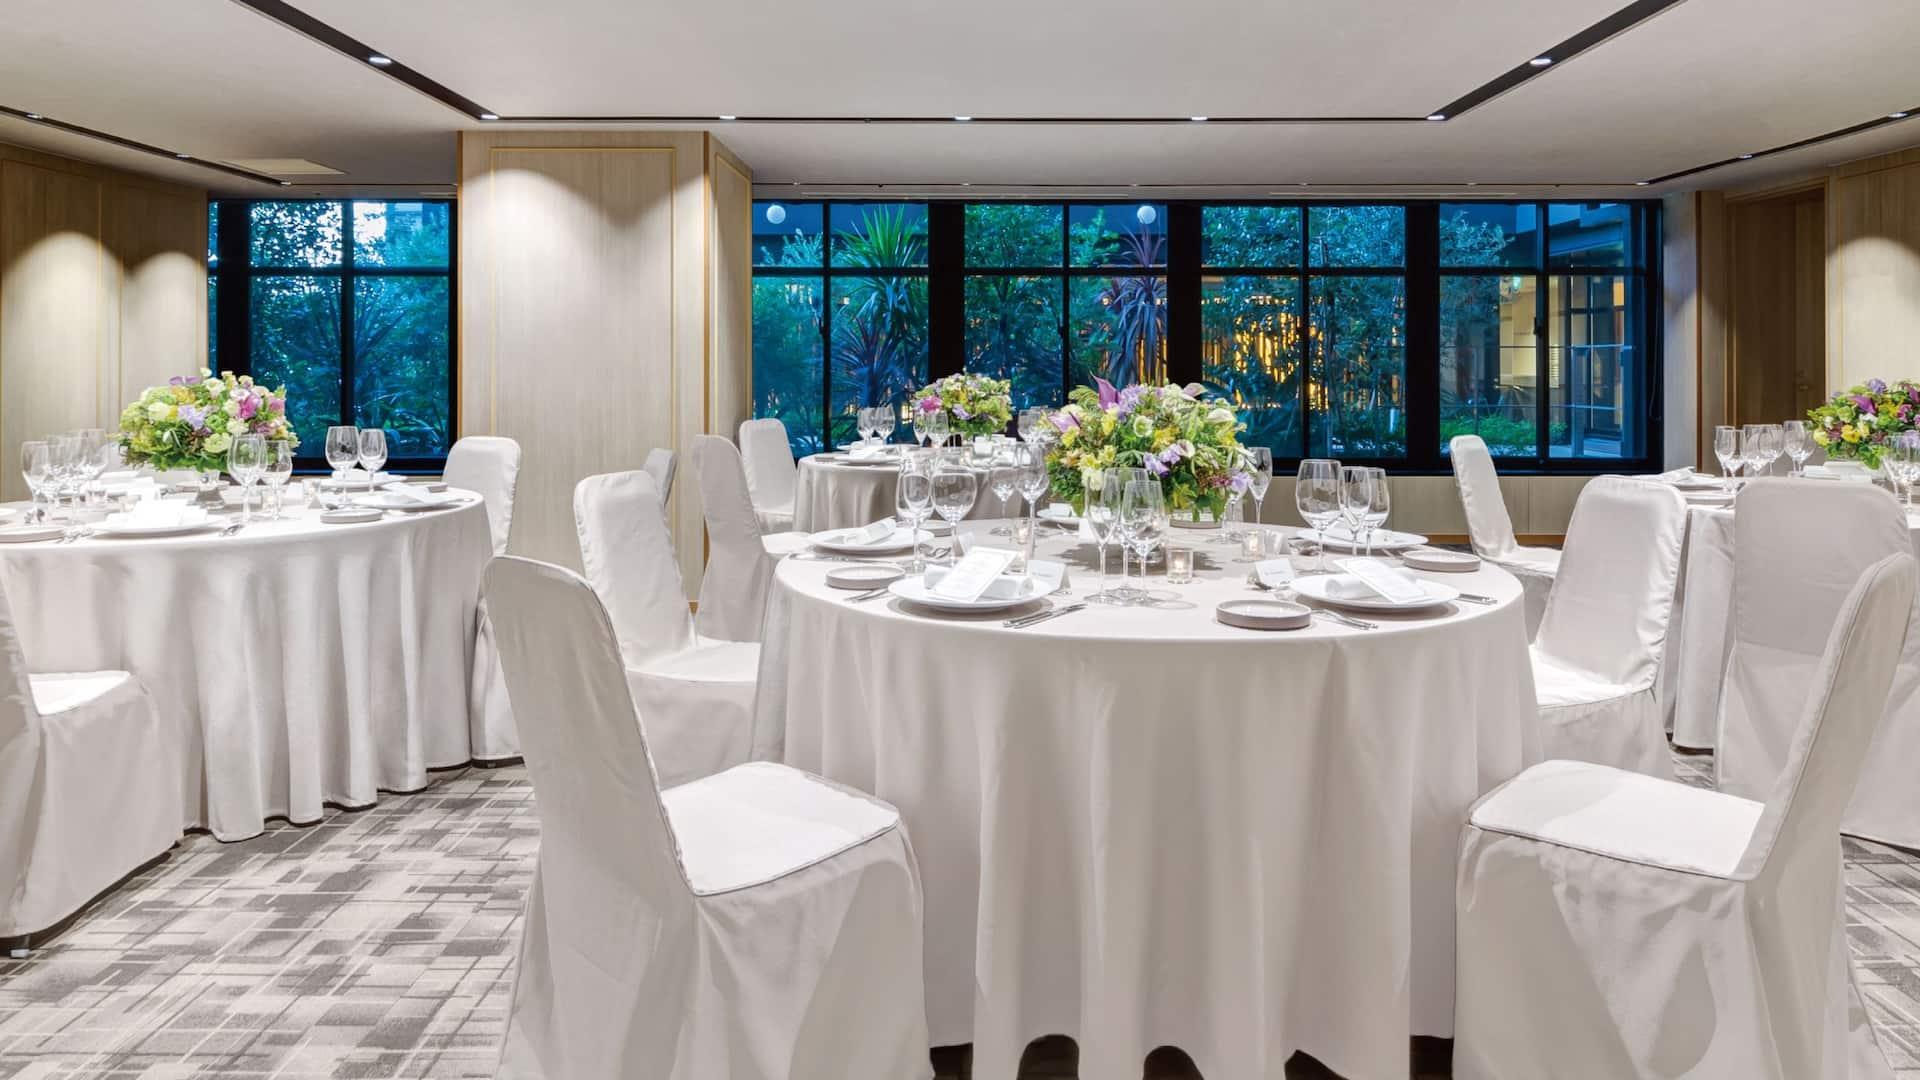 Banquet Room Party Setup